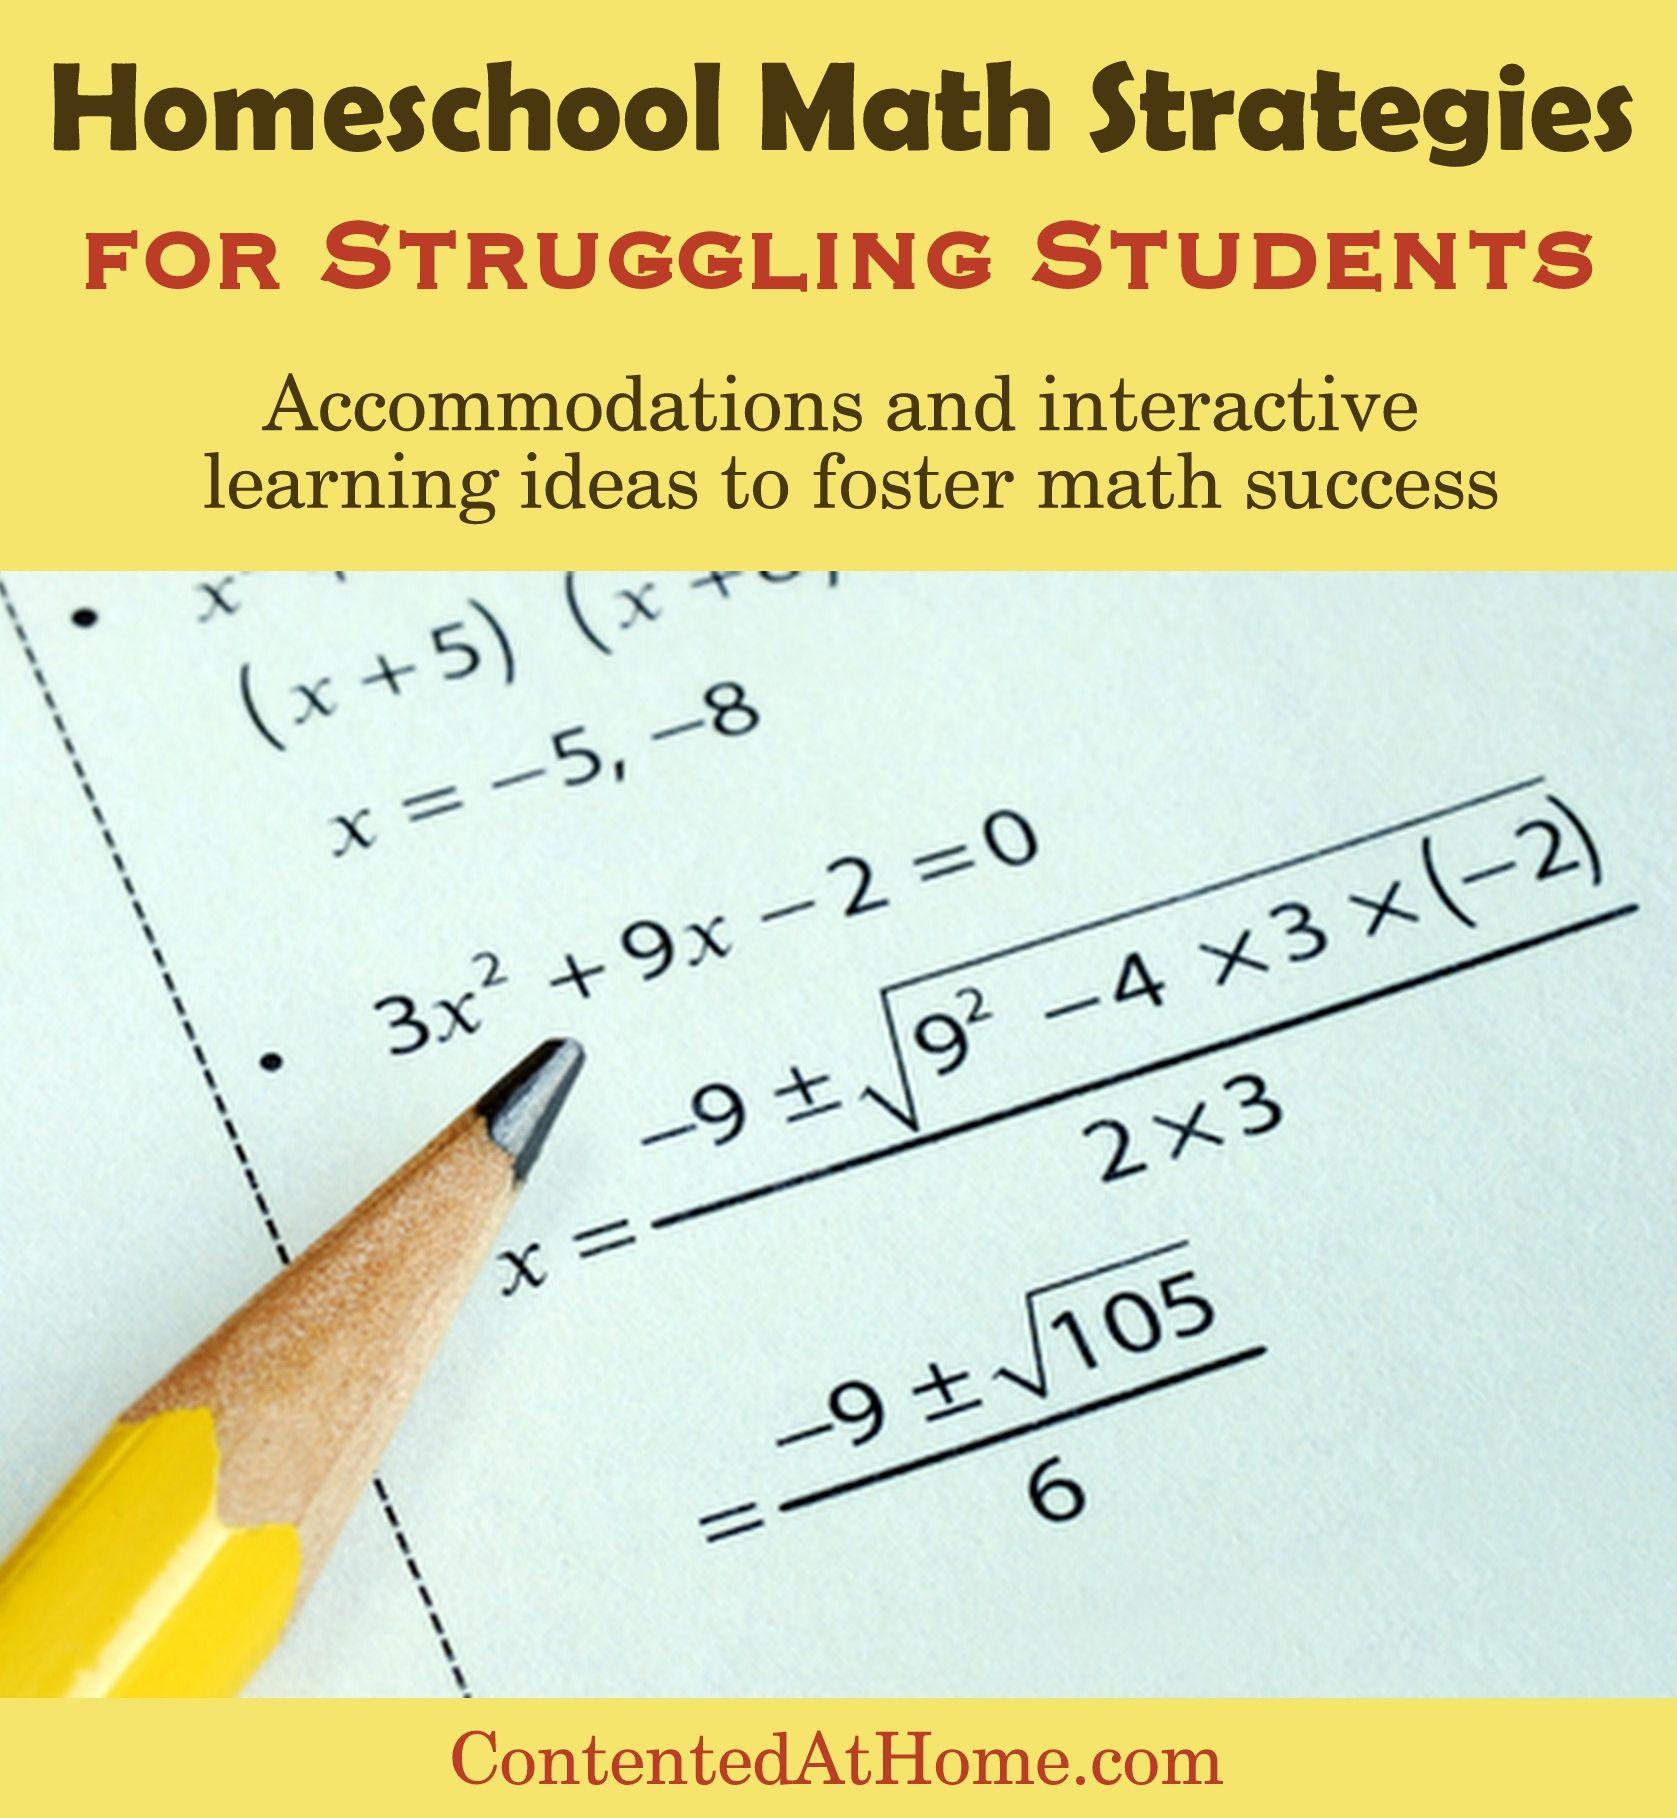 Homeschool Math Strategies for Struggling Students | Math strategies ...